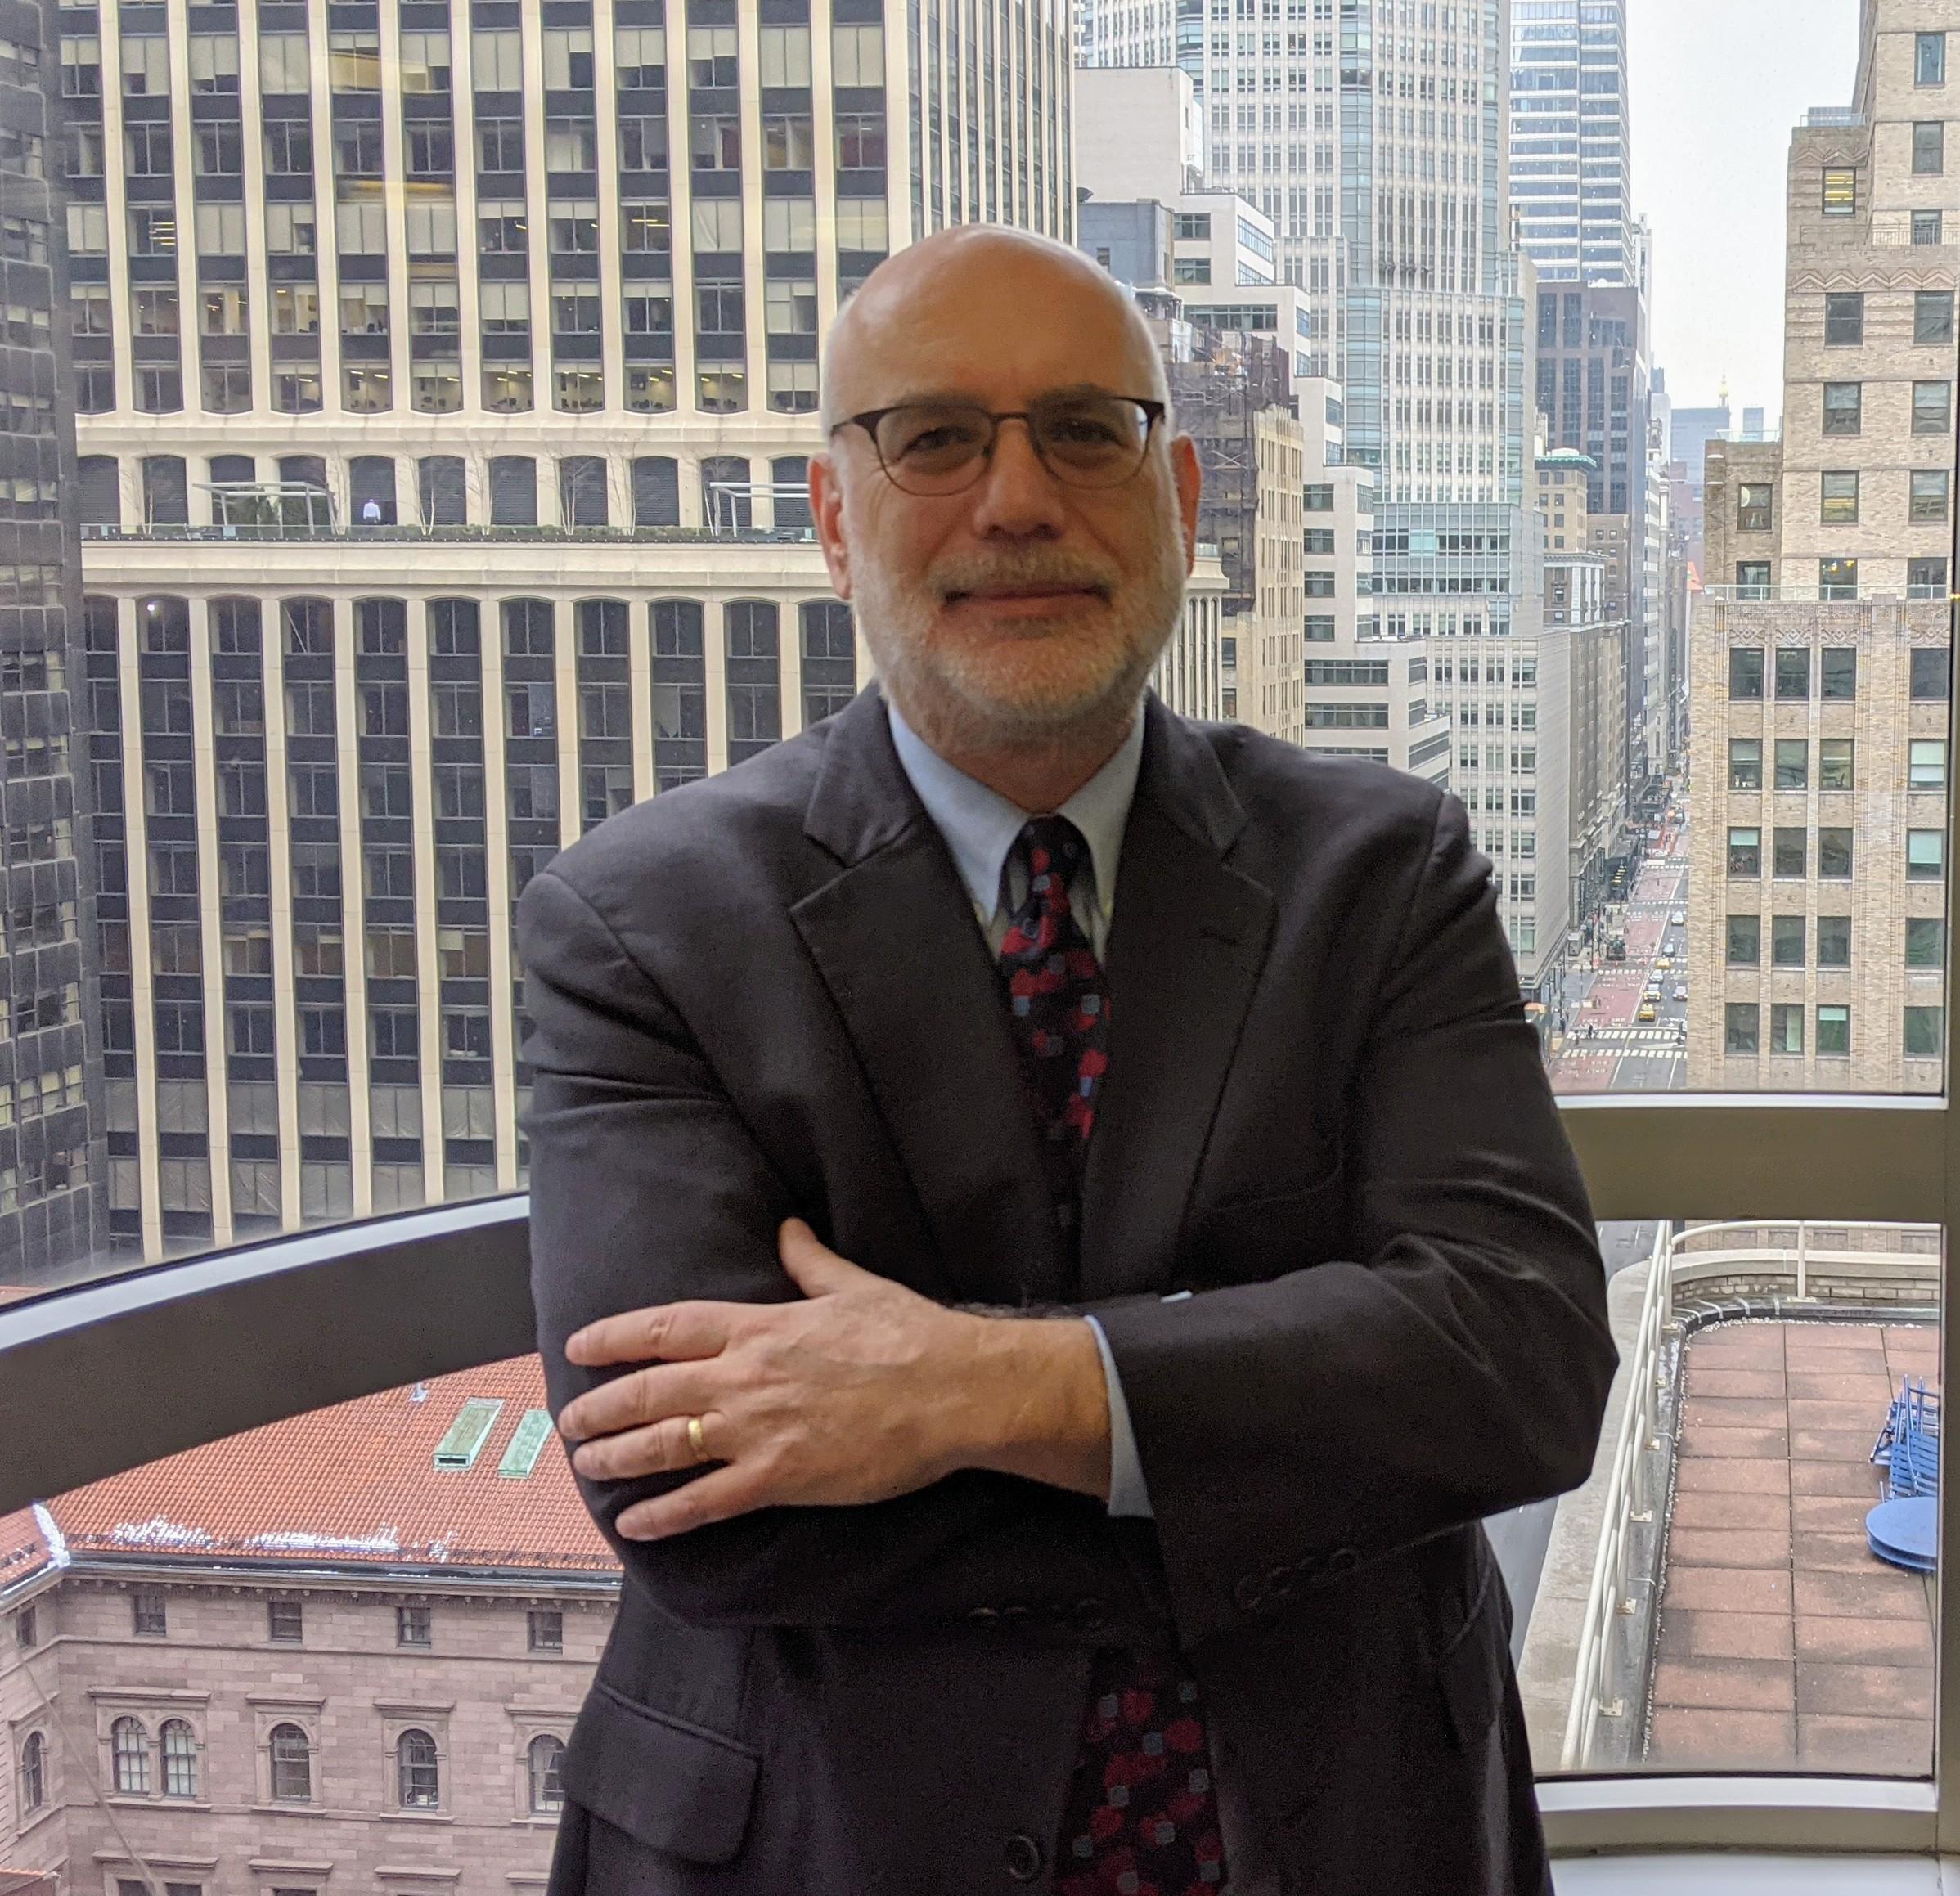 Lawdragon Recognizes Lou Pechman as a Leading U.S. Corporate Employment Lawyer